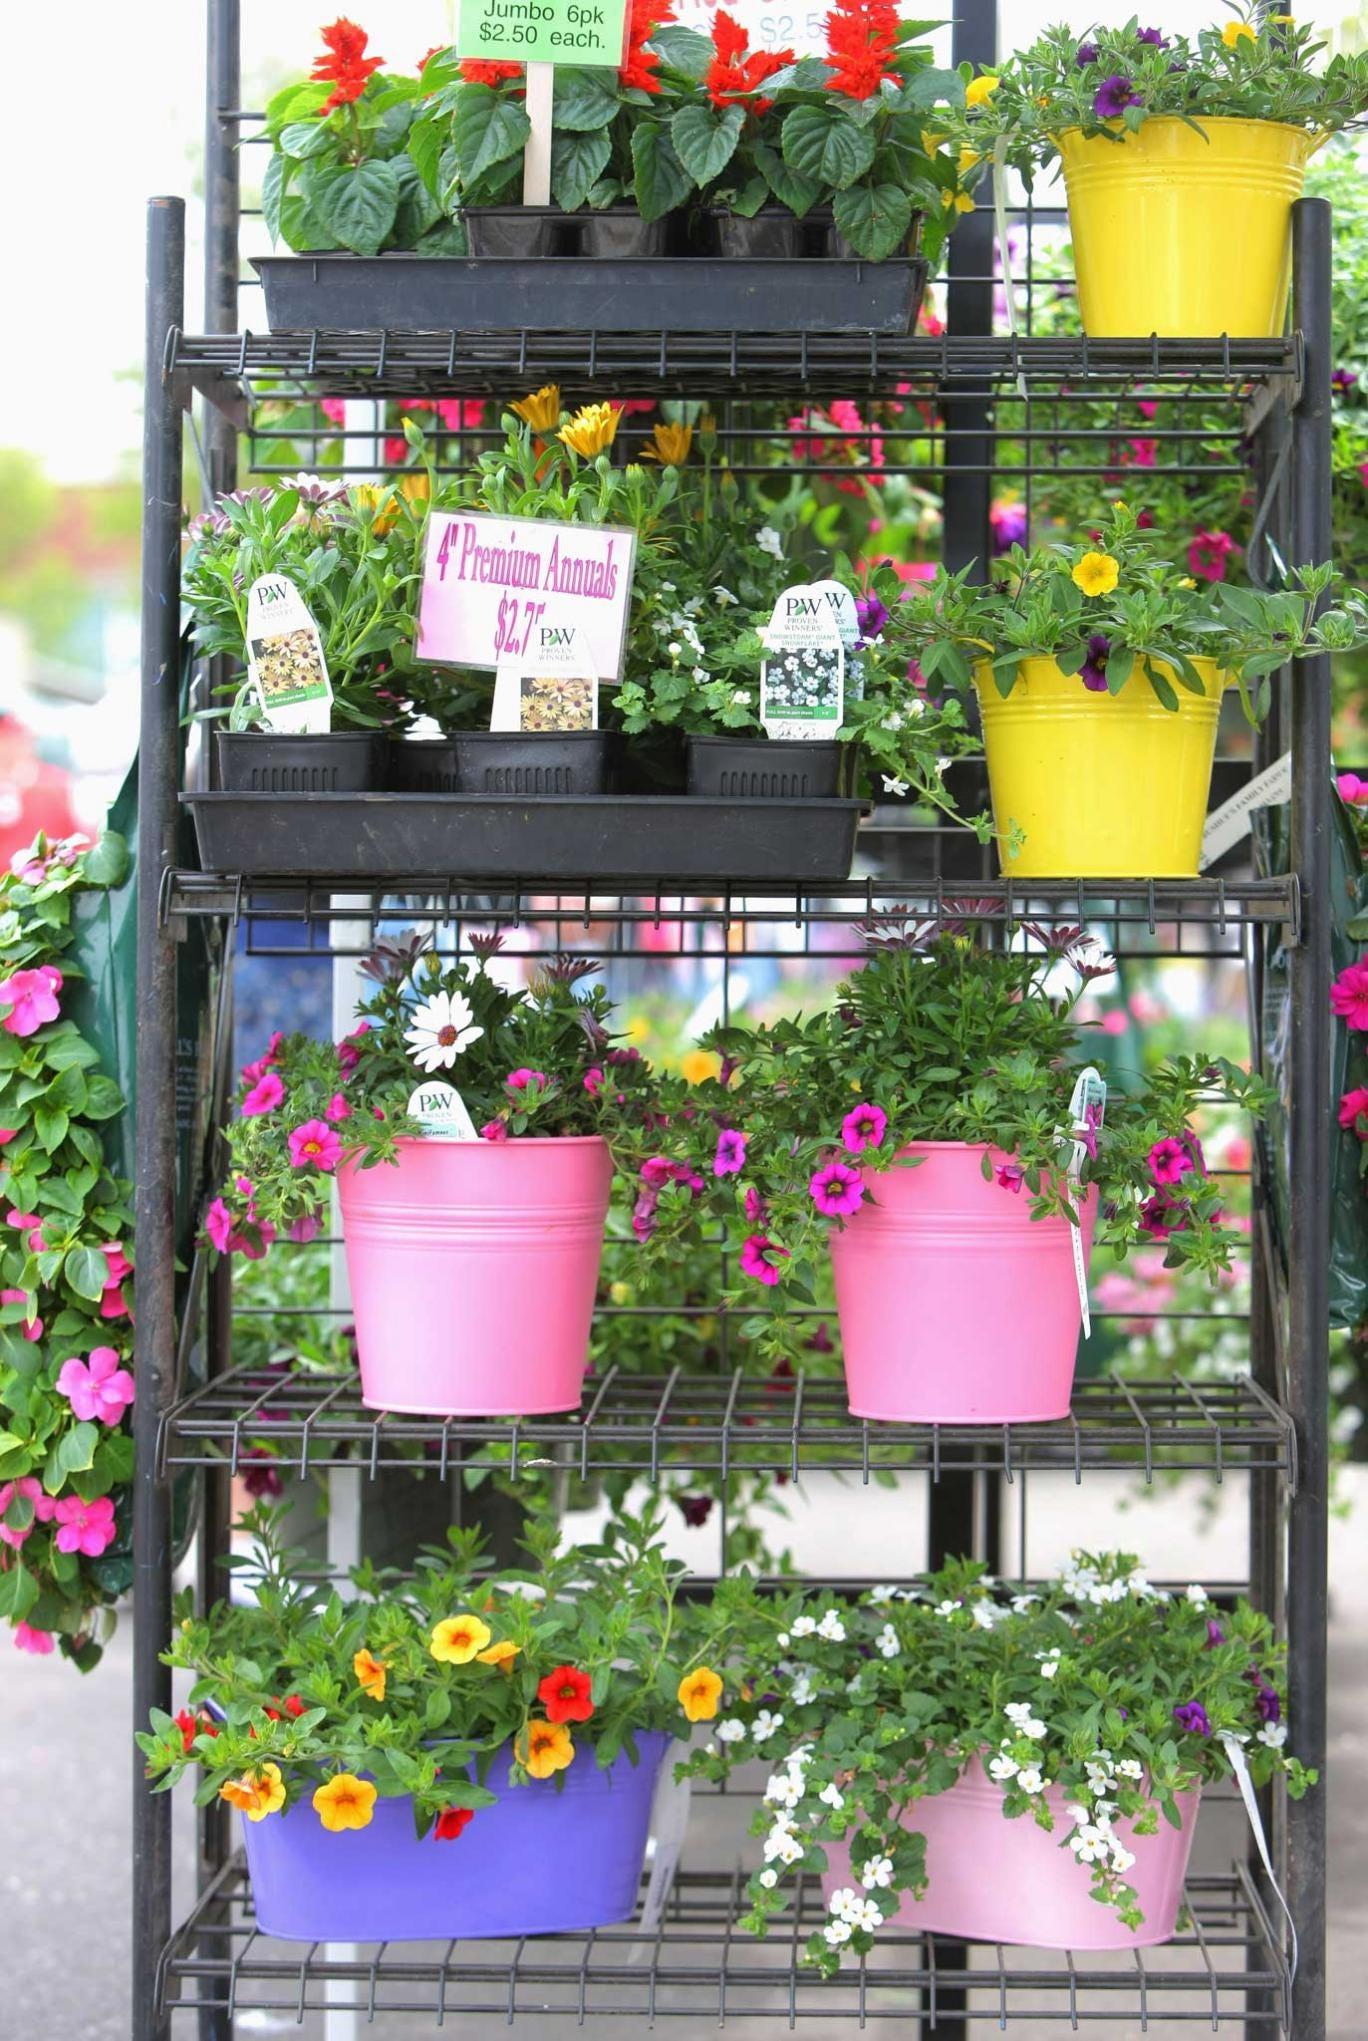 Pots of money: garden-centre goodies to tempt you towards your next impulse purchase